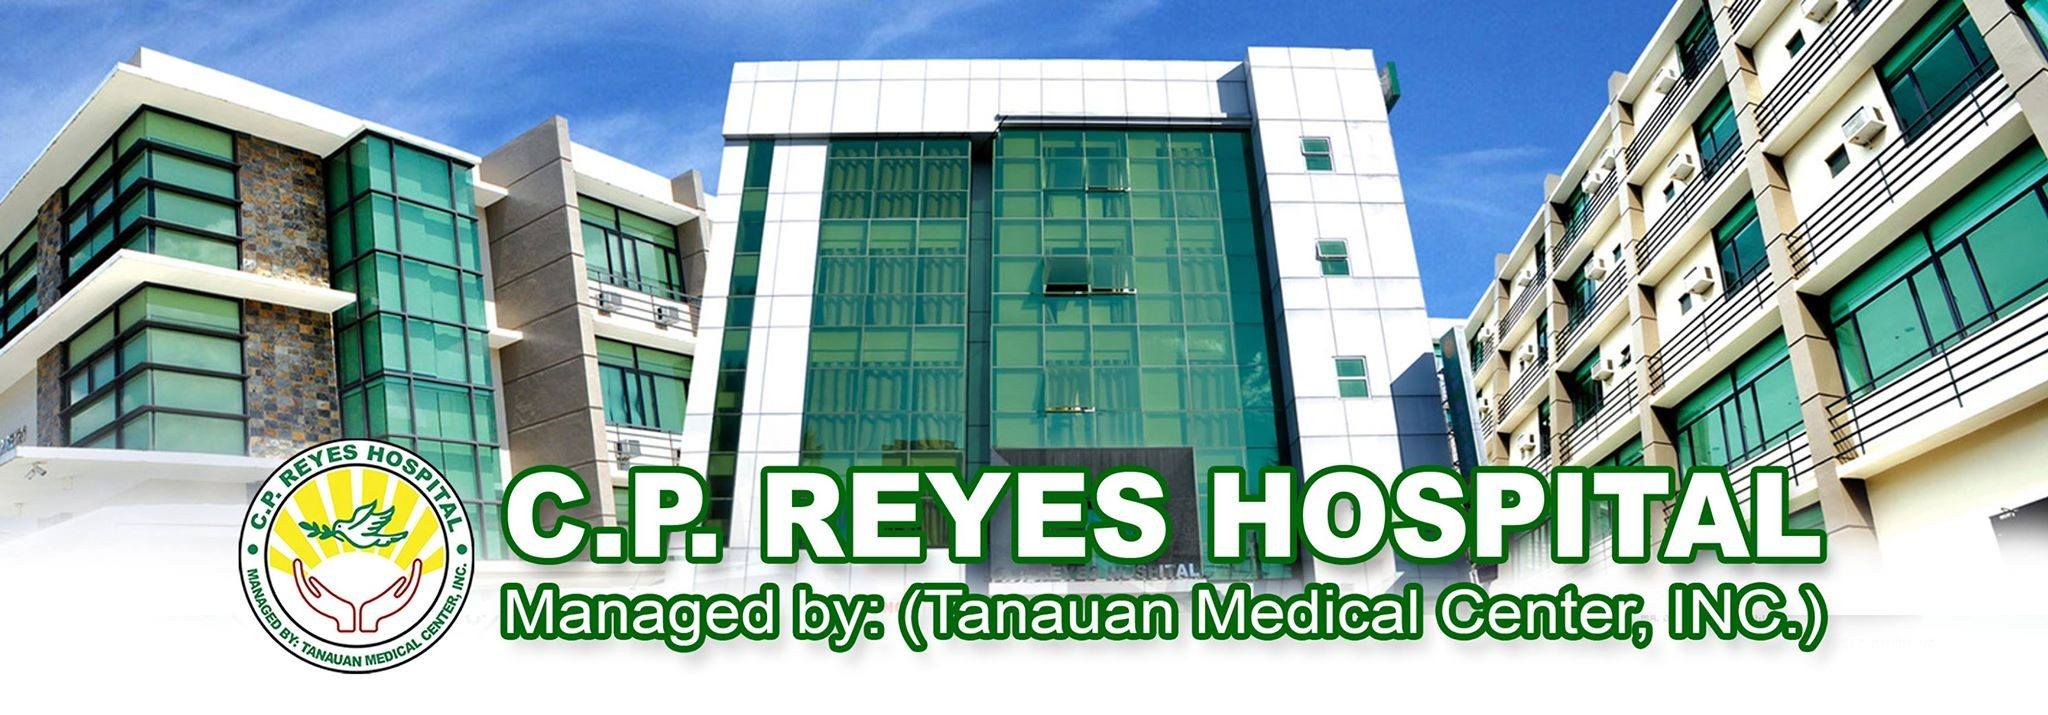 C. P. Reyes Hospital